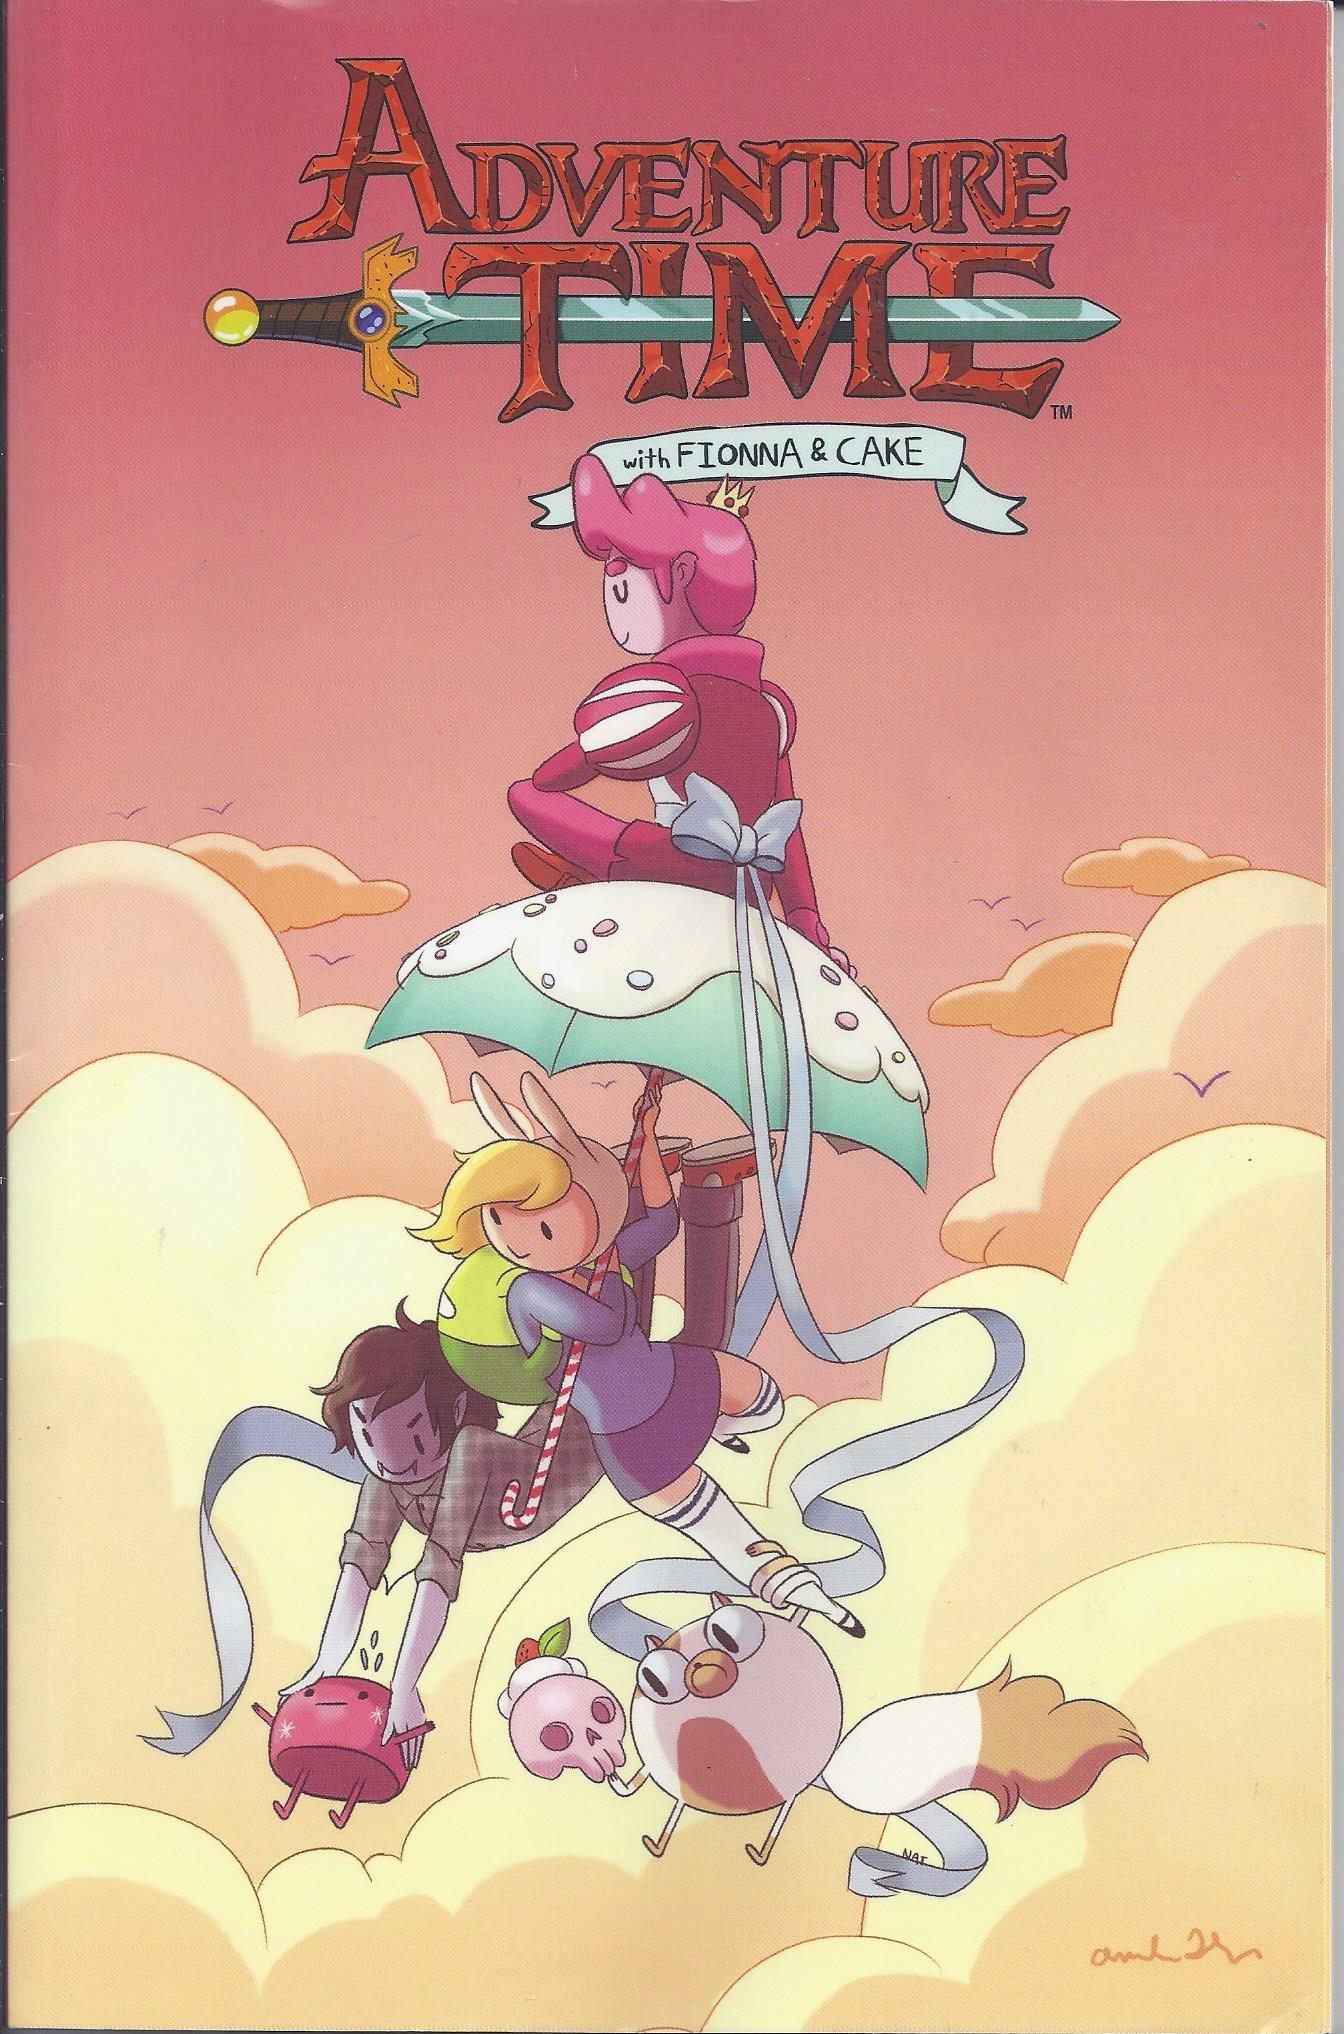 Adventure Time with Finonna & Cake ebook